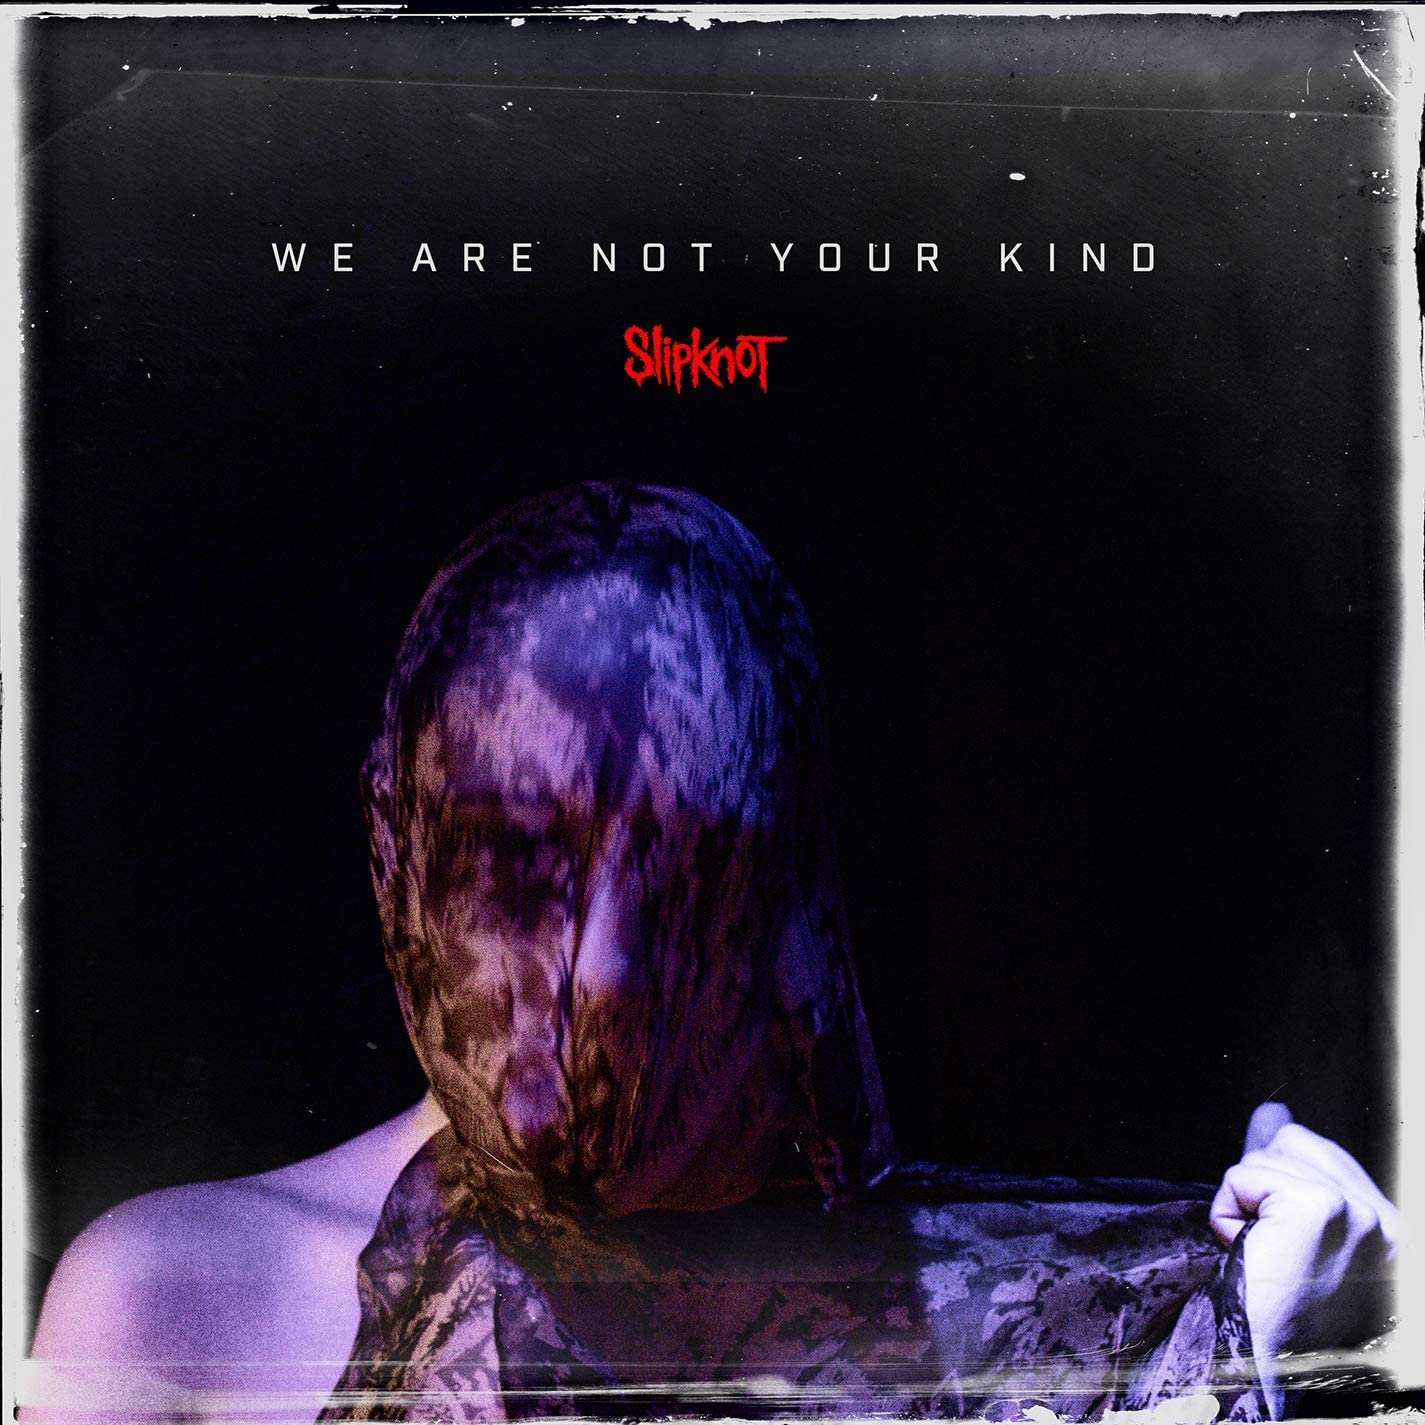 Copertina Vinile 33 giri We Are Not Your Kind [2 LP] di Slipknot